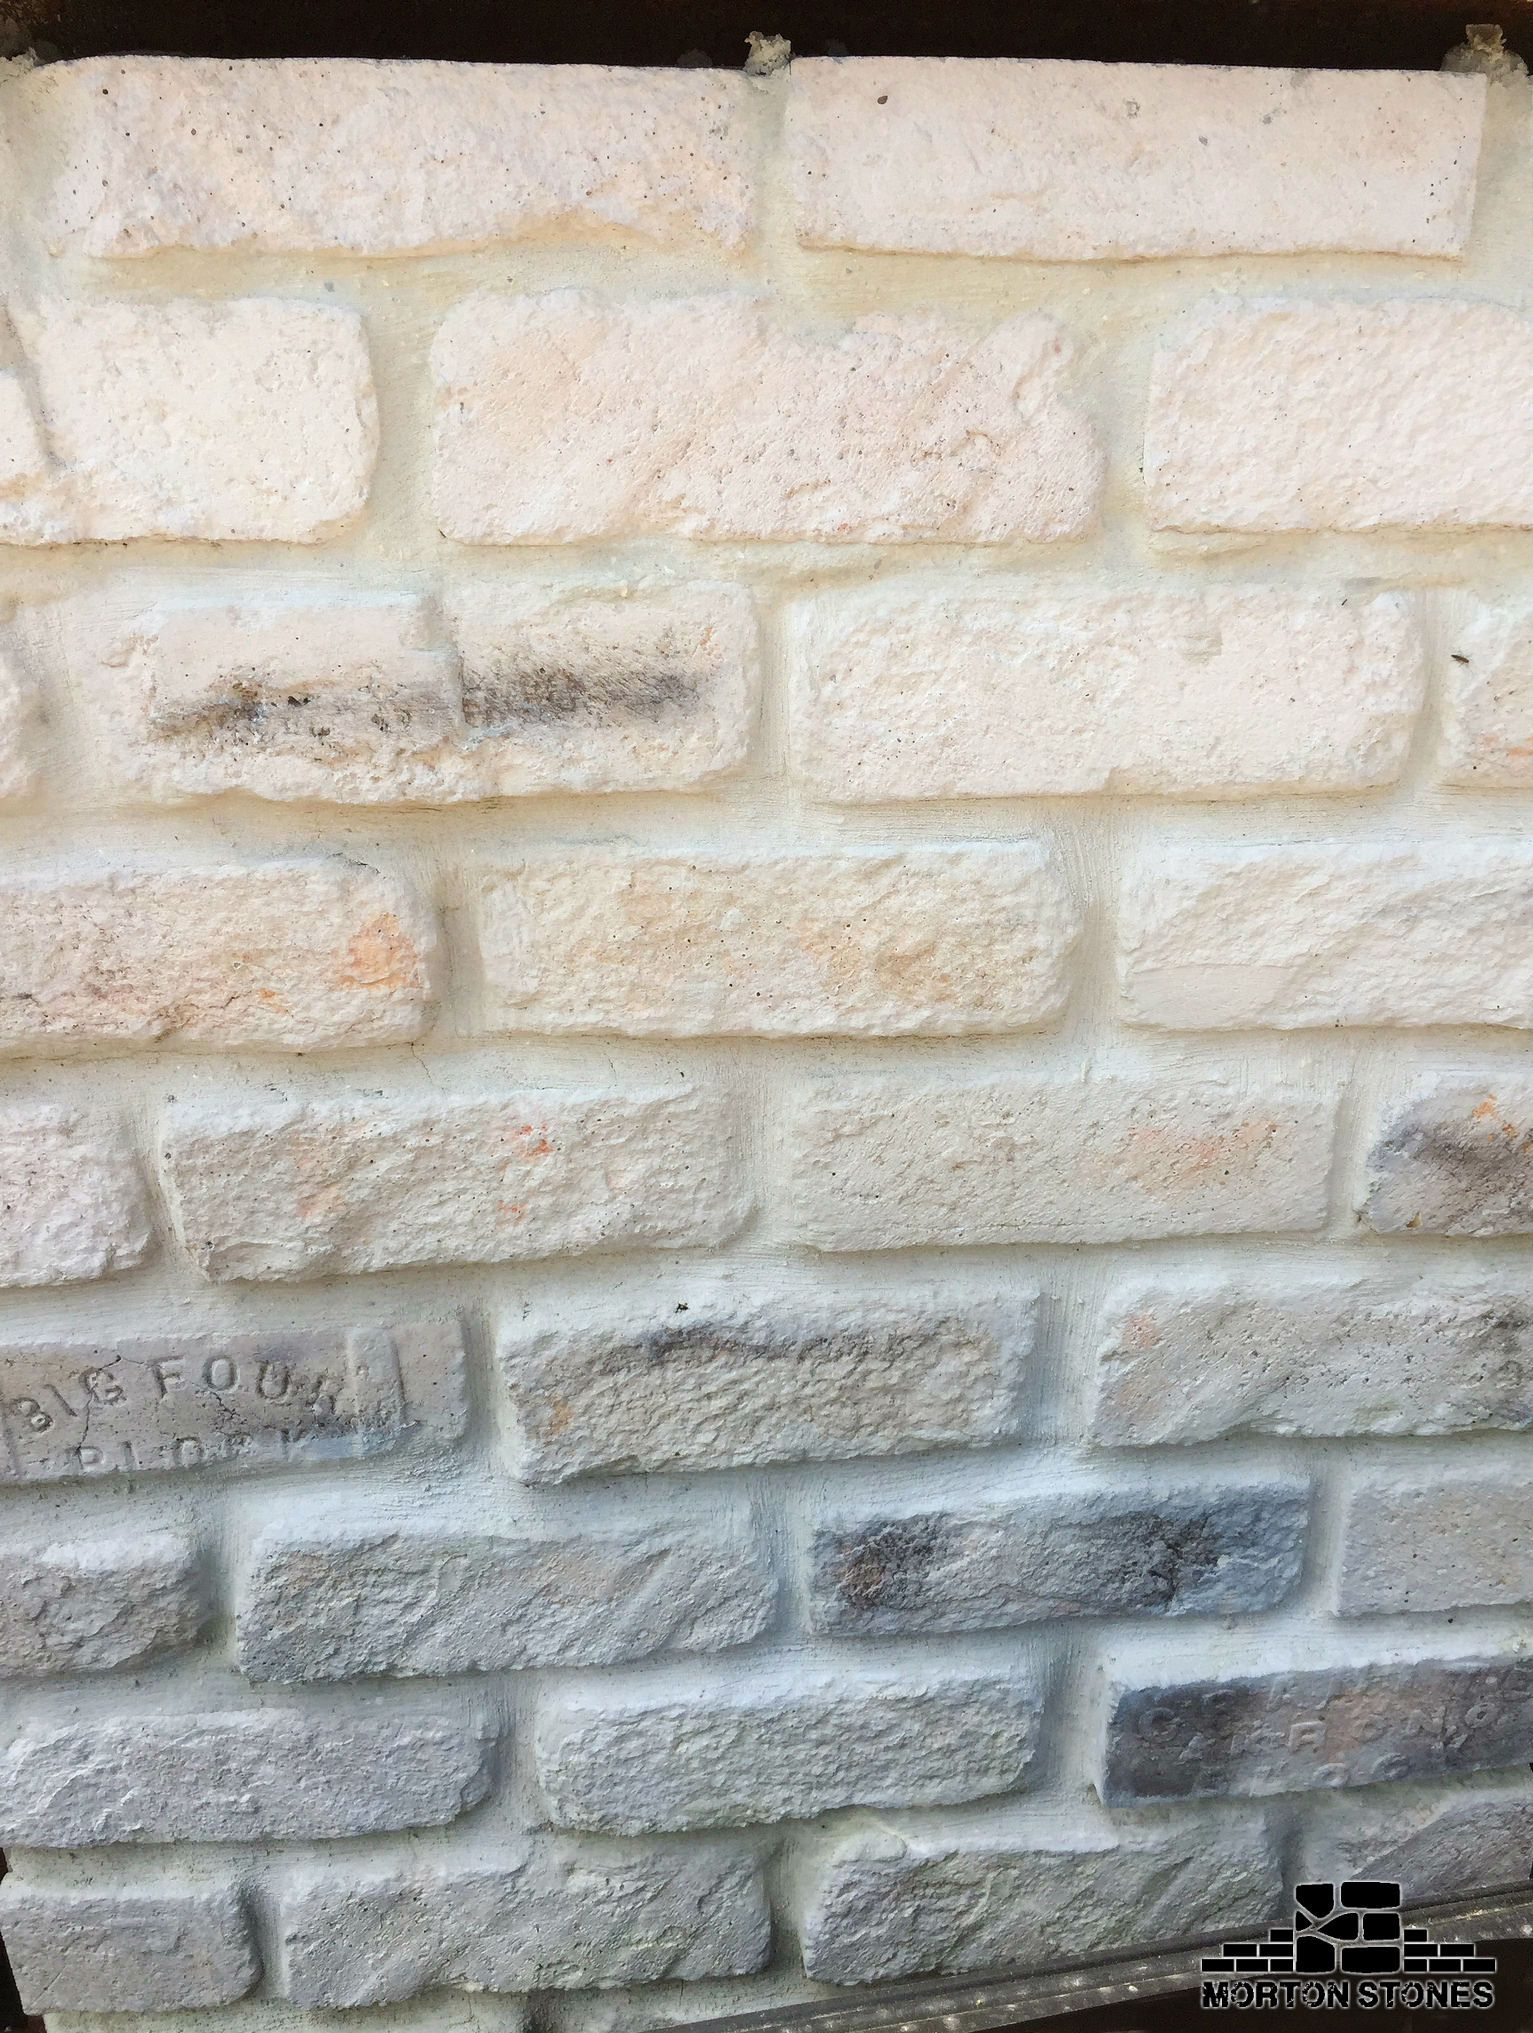 An Amazing Whitewashed Brick Veneer Wall Mortonstones Brick Tiles Rustic Thinbrick Home Decor Redbrick Brick Veneer Wall Brick Veneer White Wash Brick